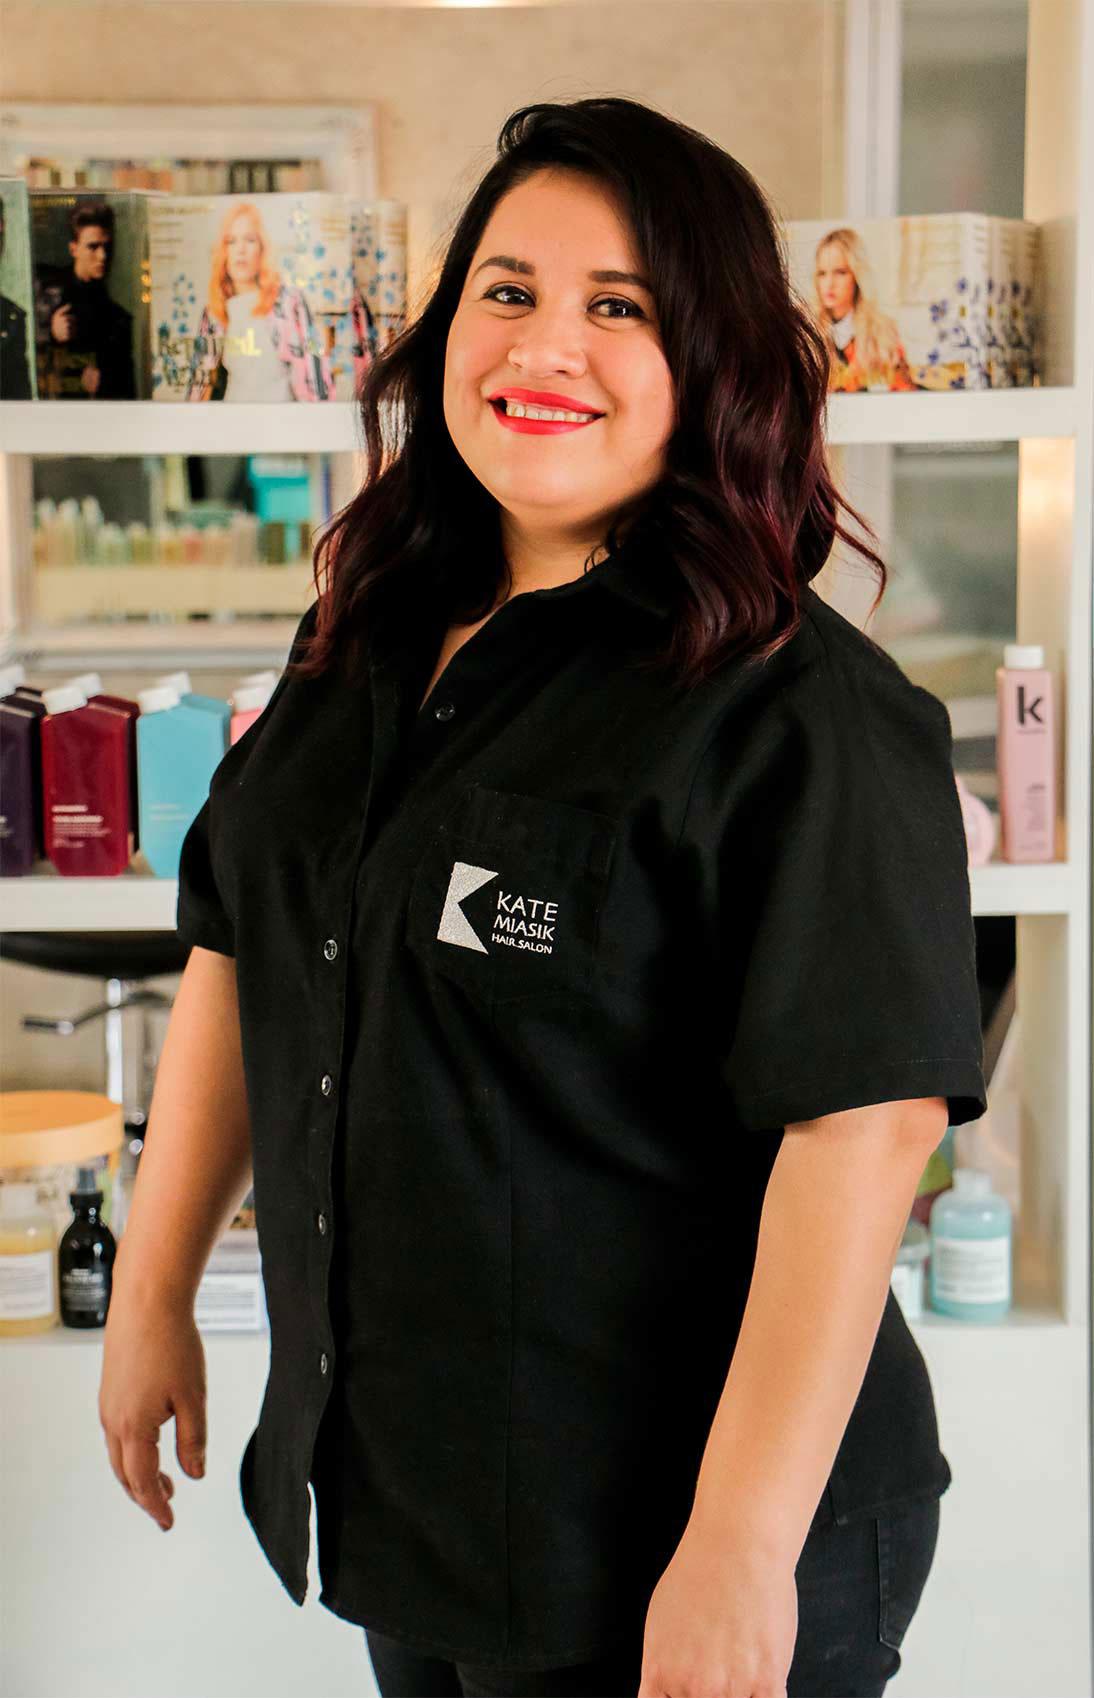 Clara - Kate Miasik Salon